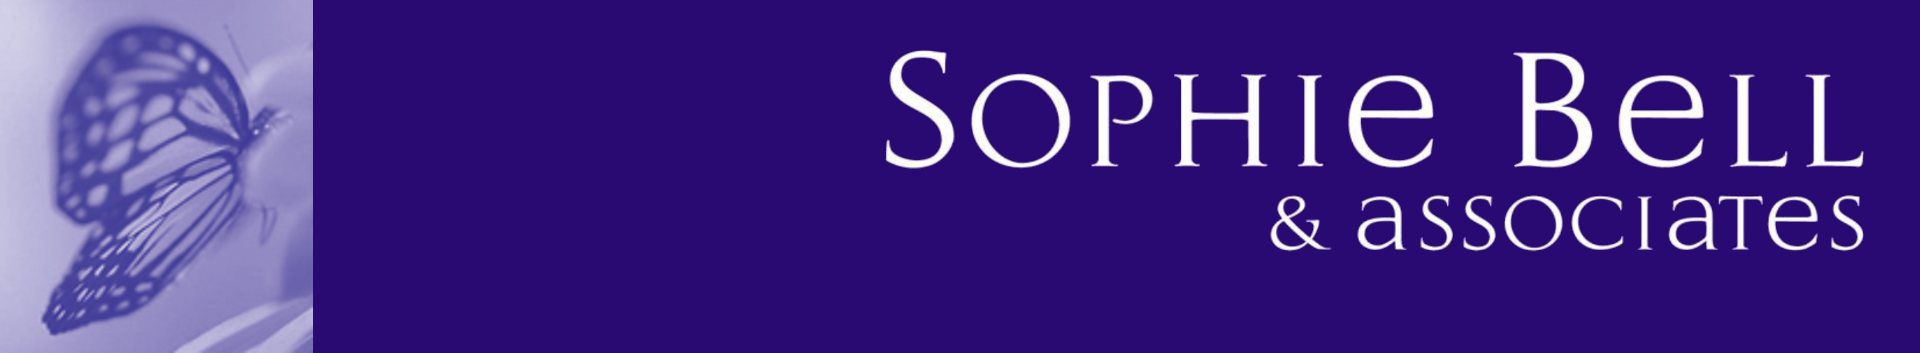 Sophie Bell & Associates Logo